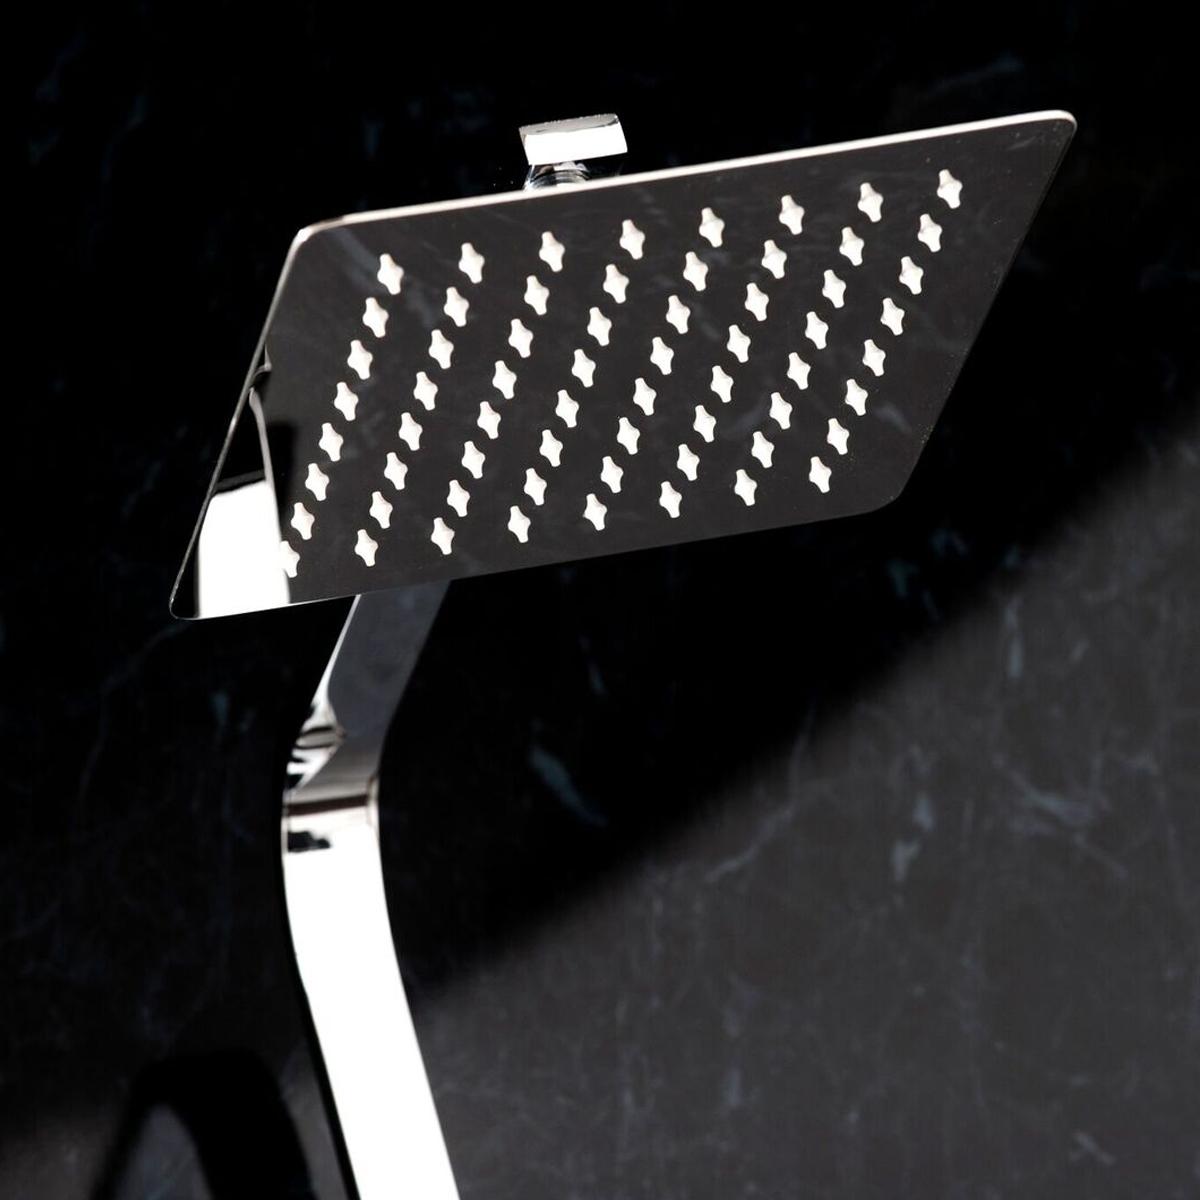 Cali Quadrato Bar Mixer Shower with Shower Kit + Fixed Head-1